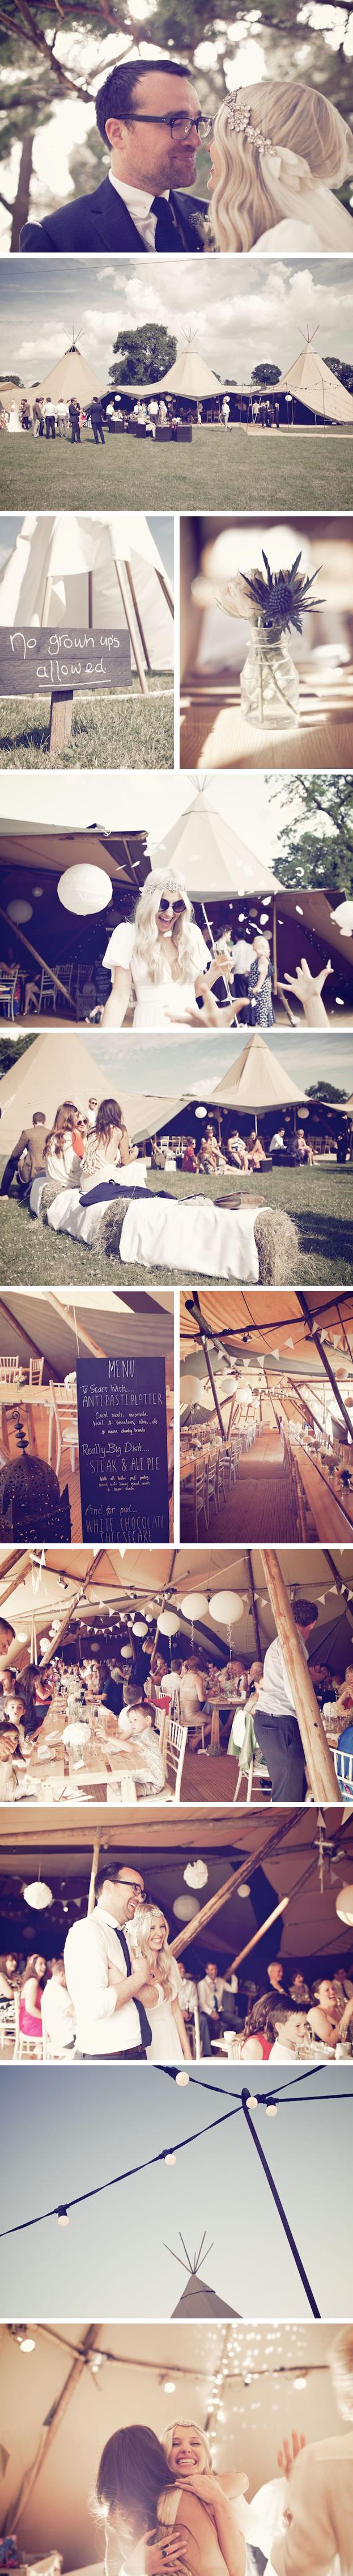 Sarah & Kevin PapaKata Teepee Wedding at Standlow Farm, Derbyshire